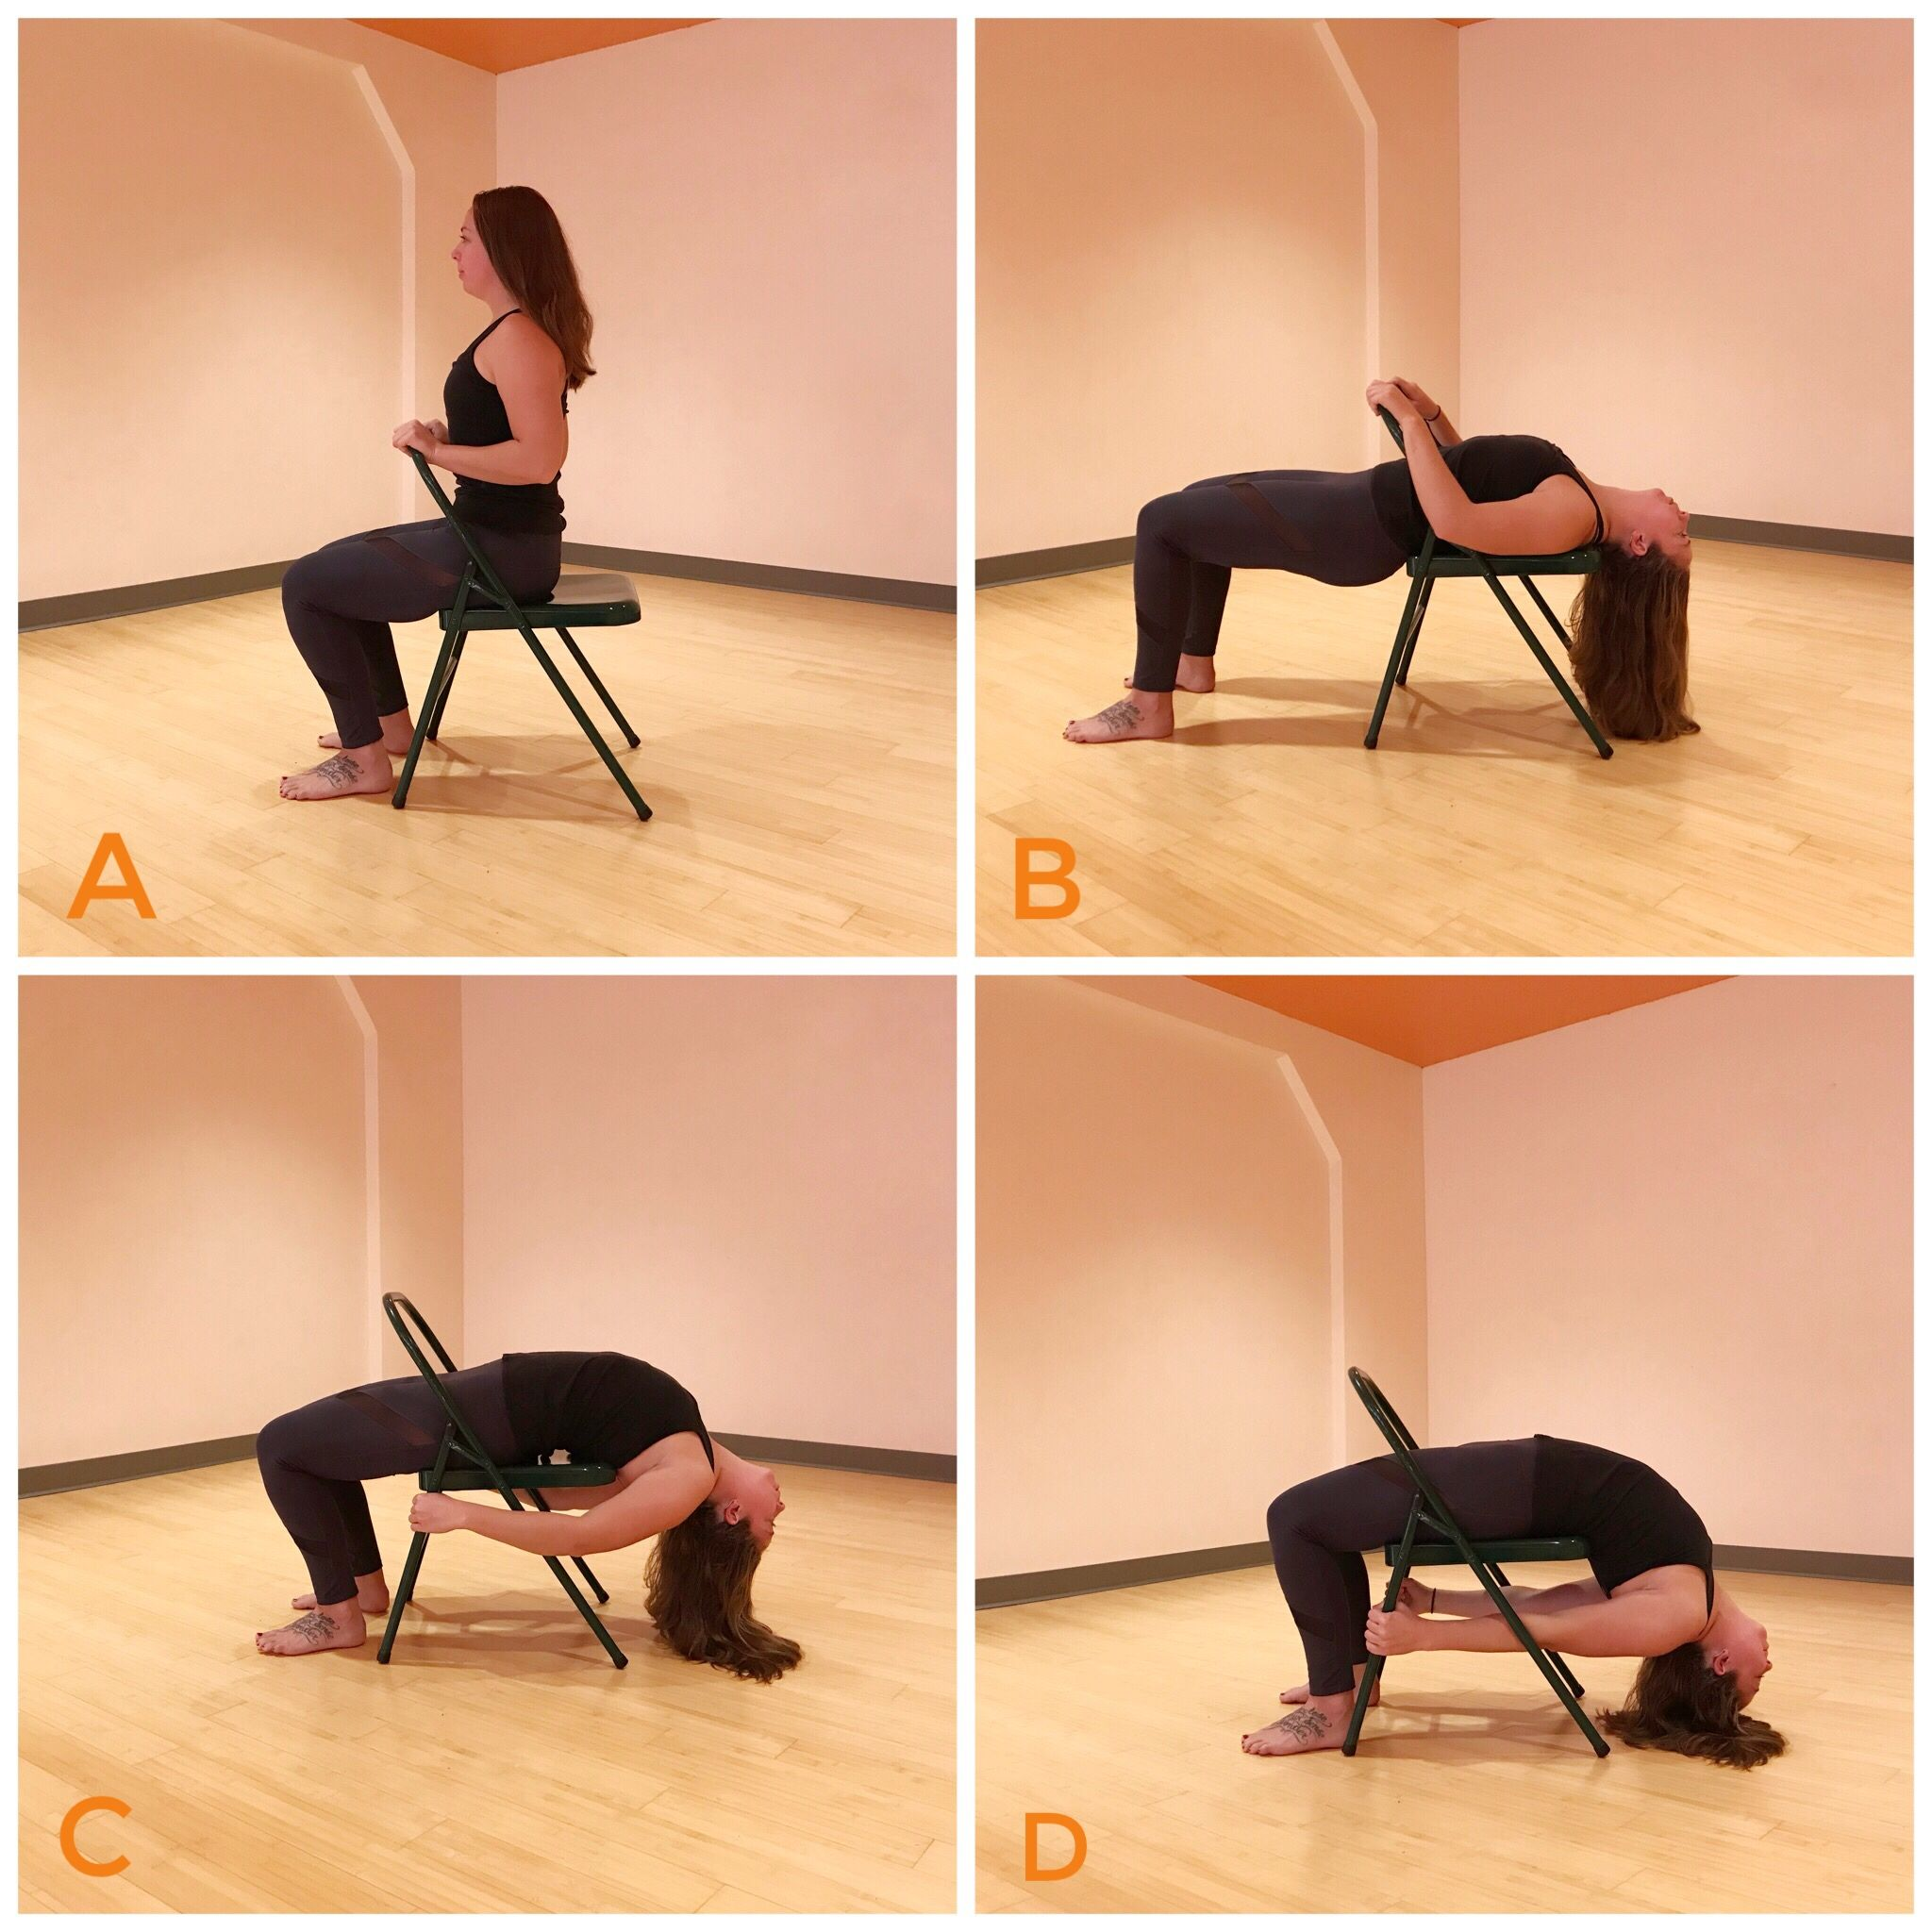 Urdhvadhanurasana Chairyoga Backbend Yogaprops Yoga Props Chair Yoga Yoga